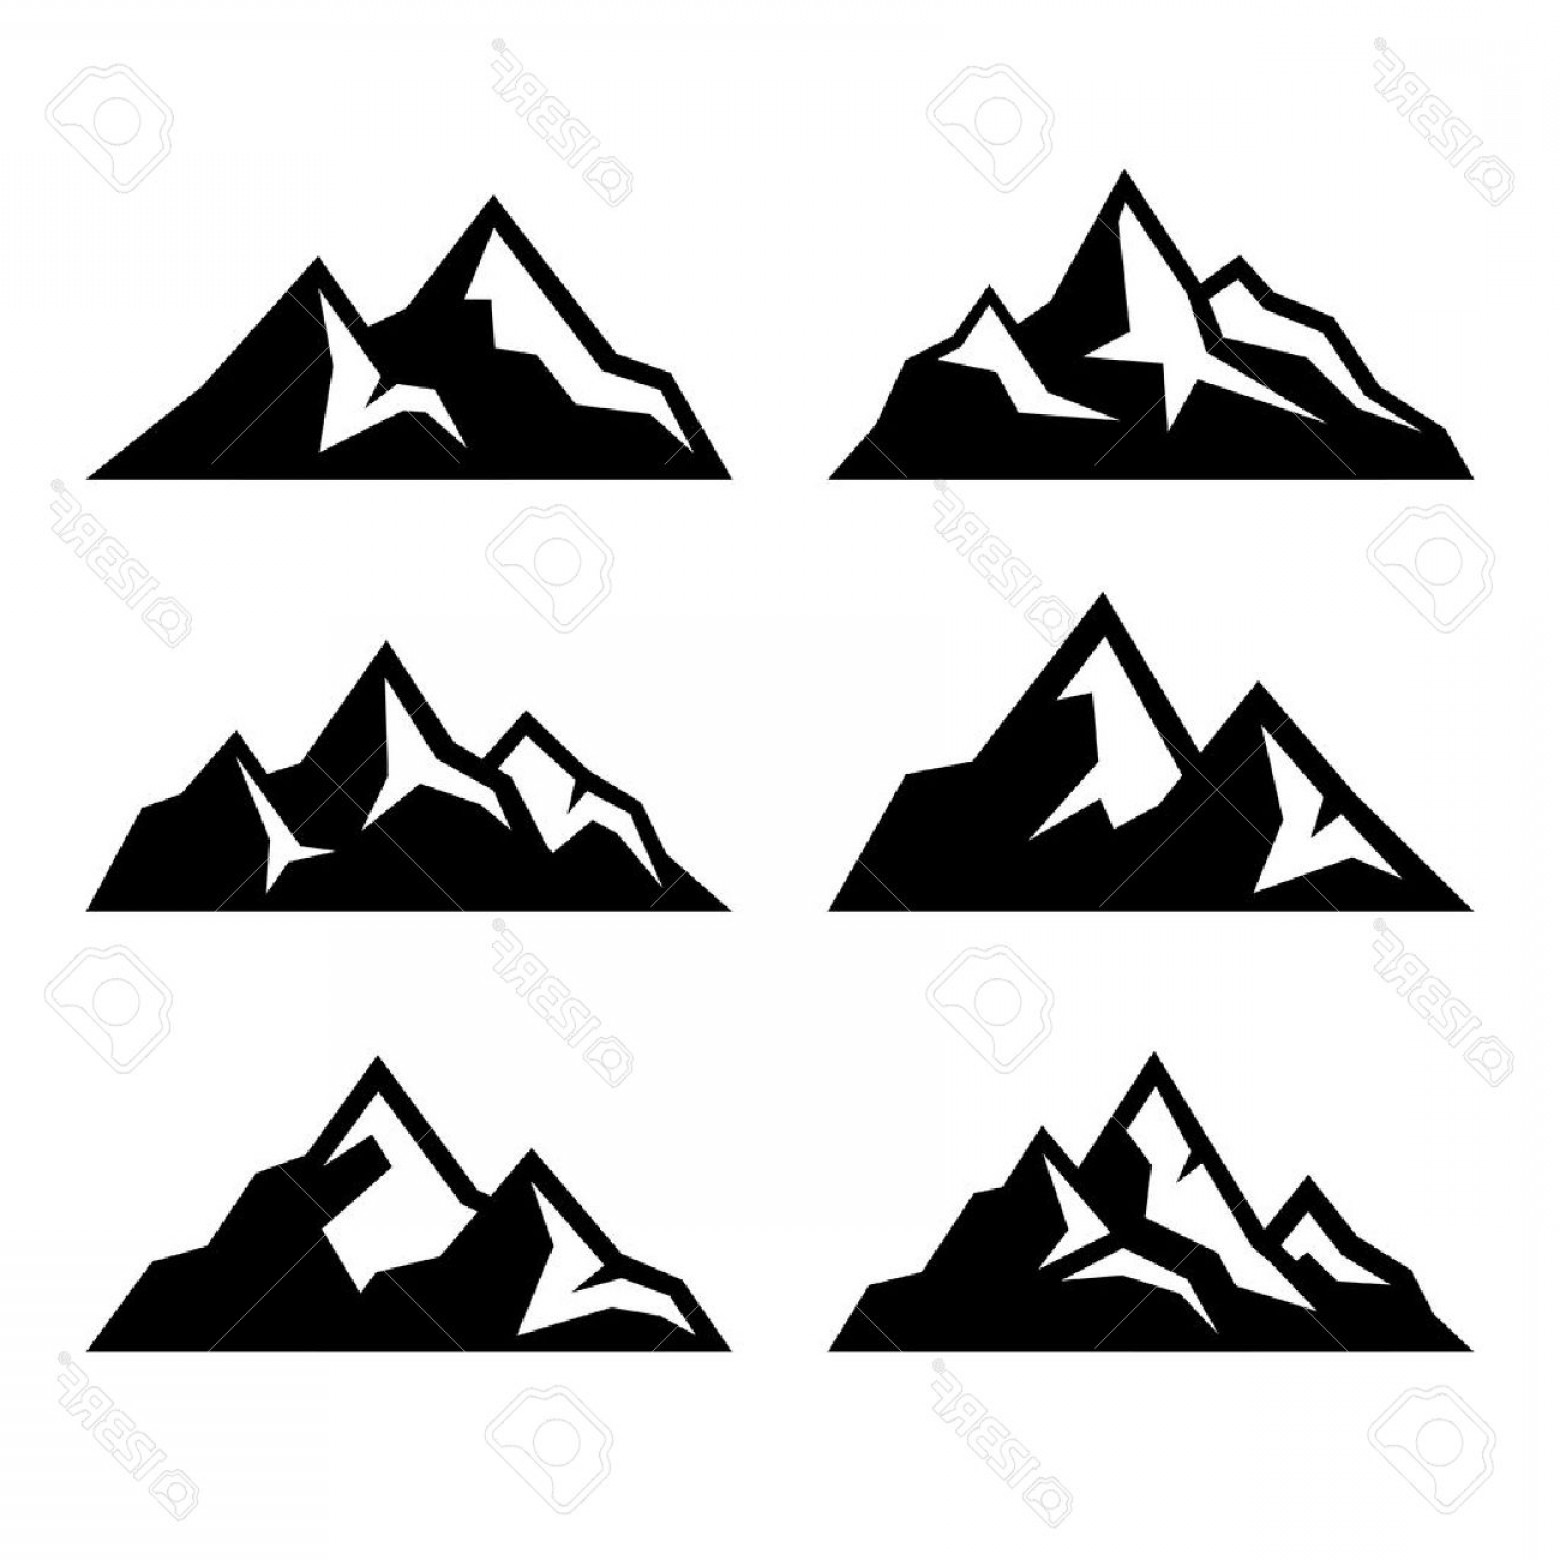 1560x1560 Photostock Vector Mountain Icons Set On White Background Vector